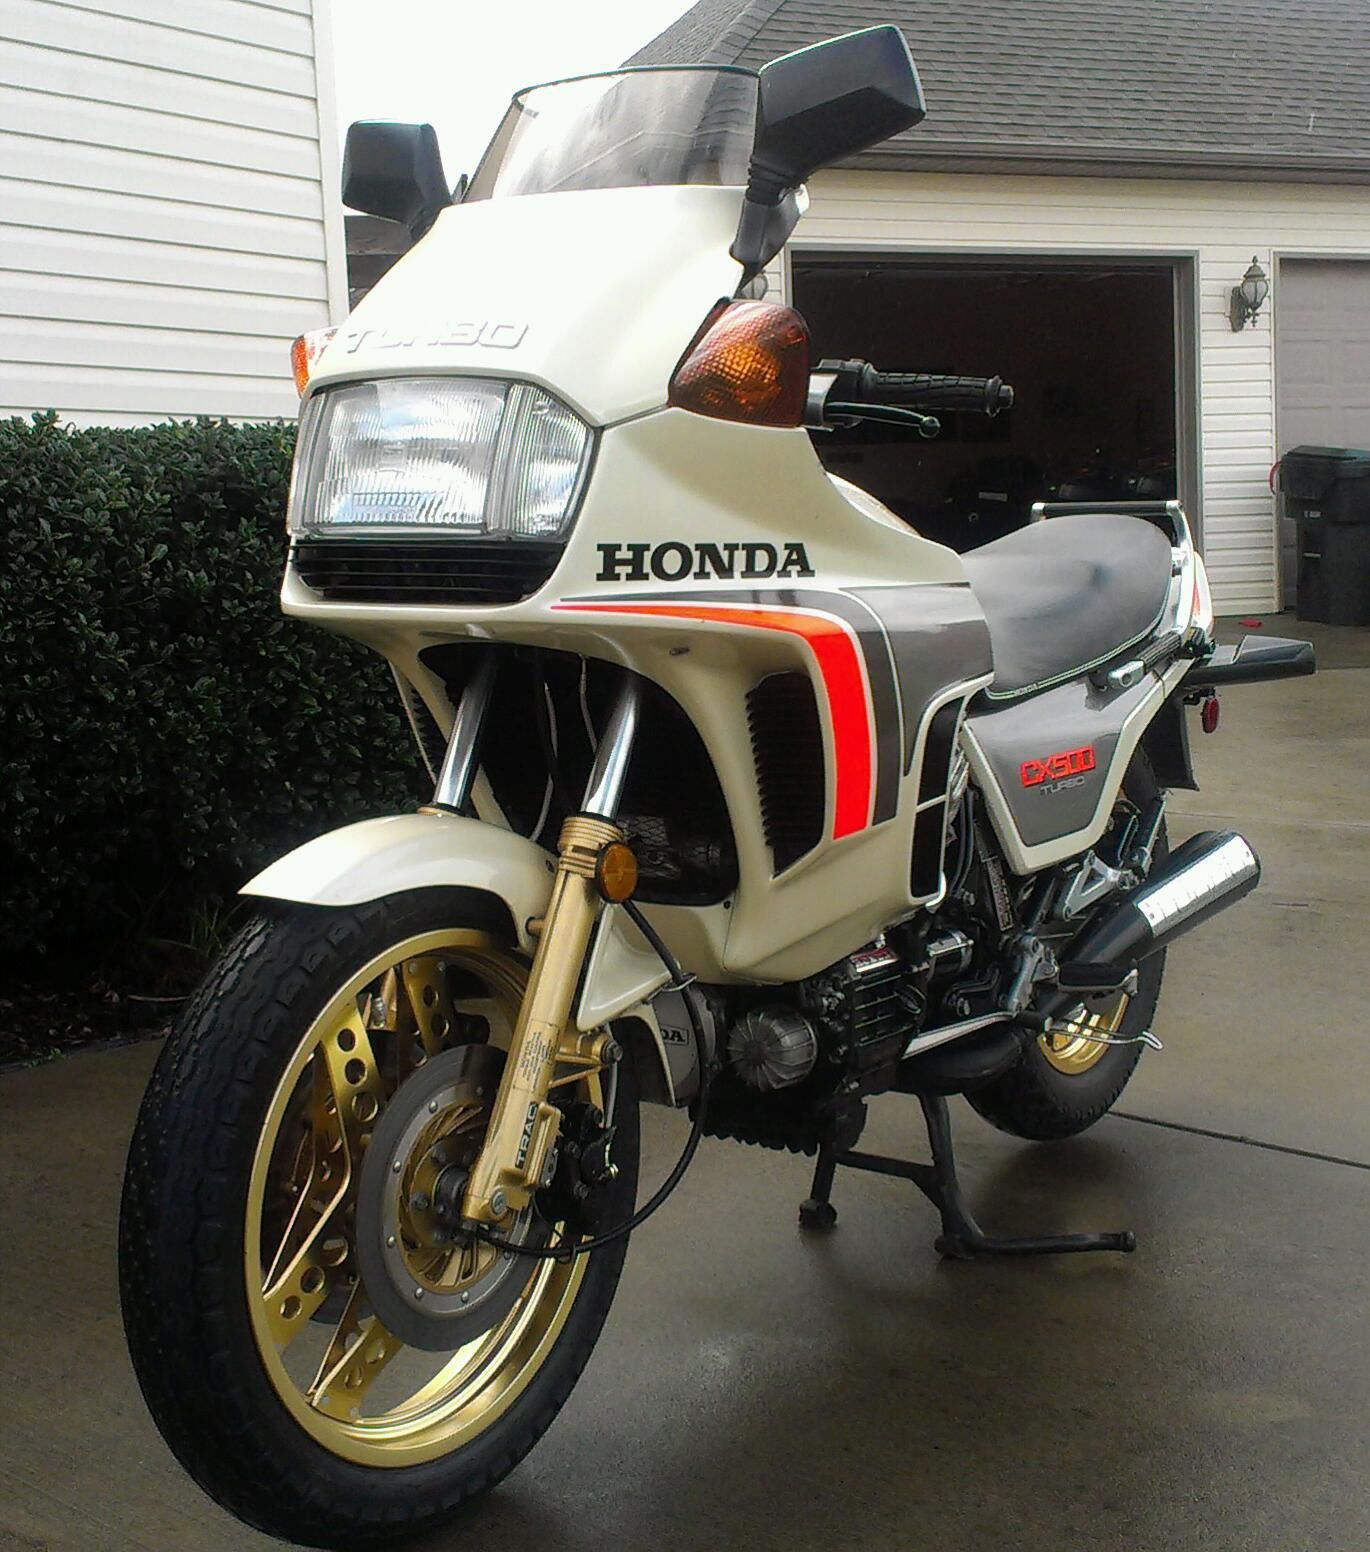 Honda Cx500 Turbo Review